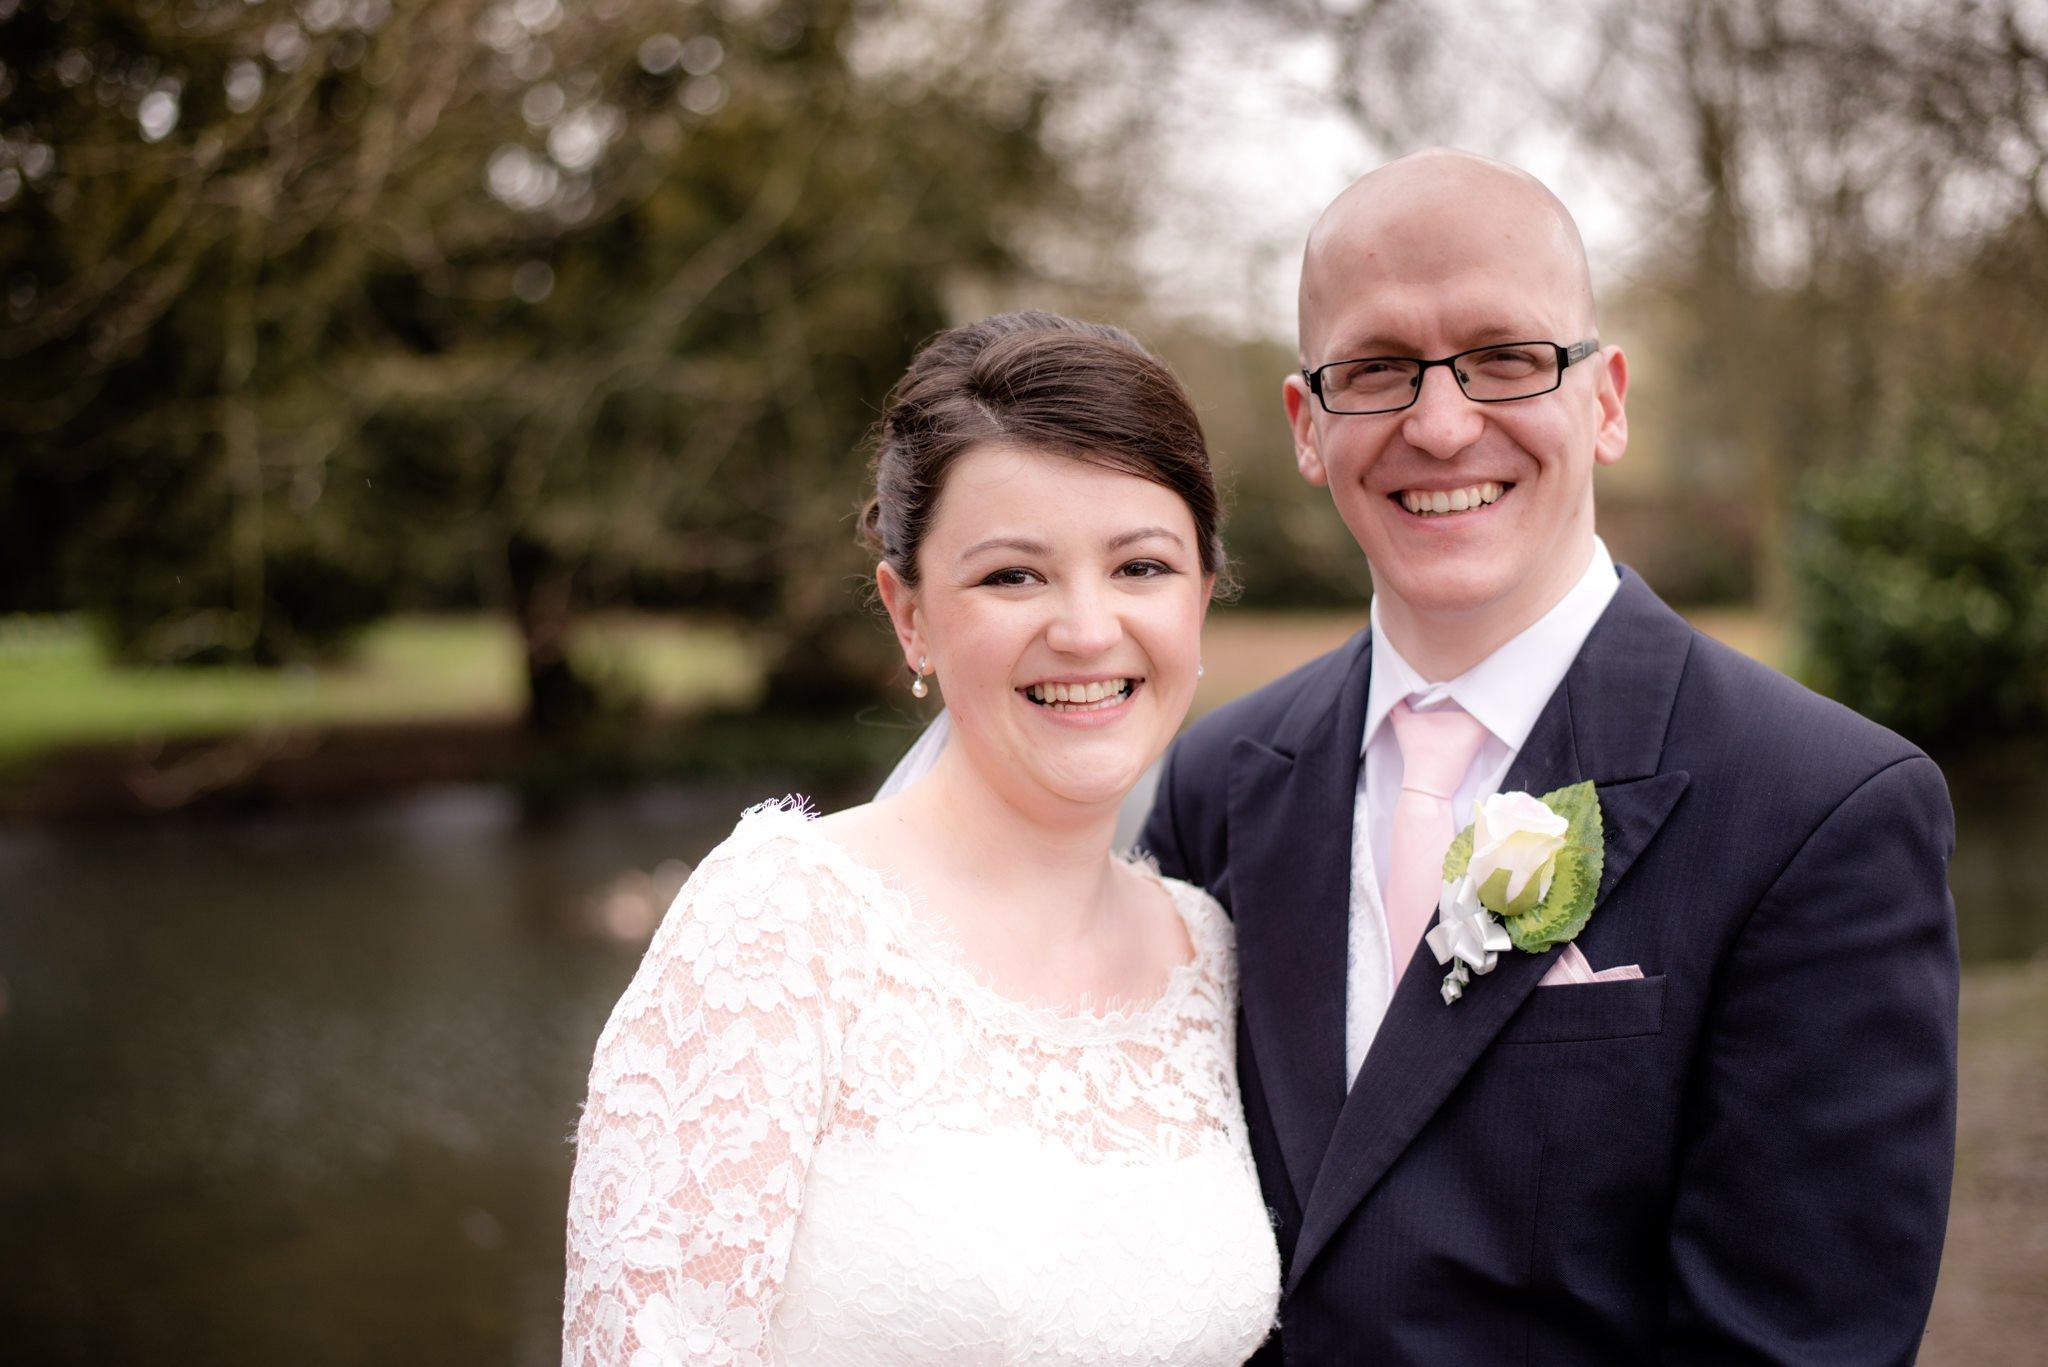 Cheshunt Wedding Photography